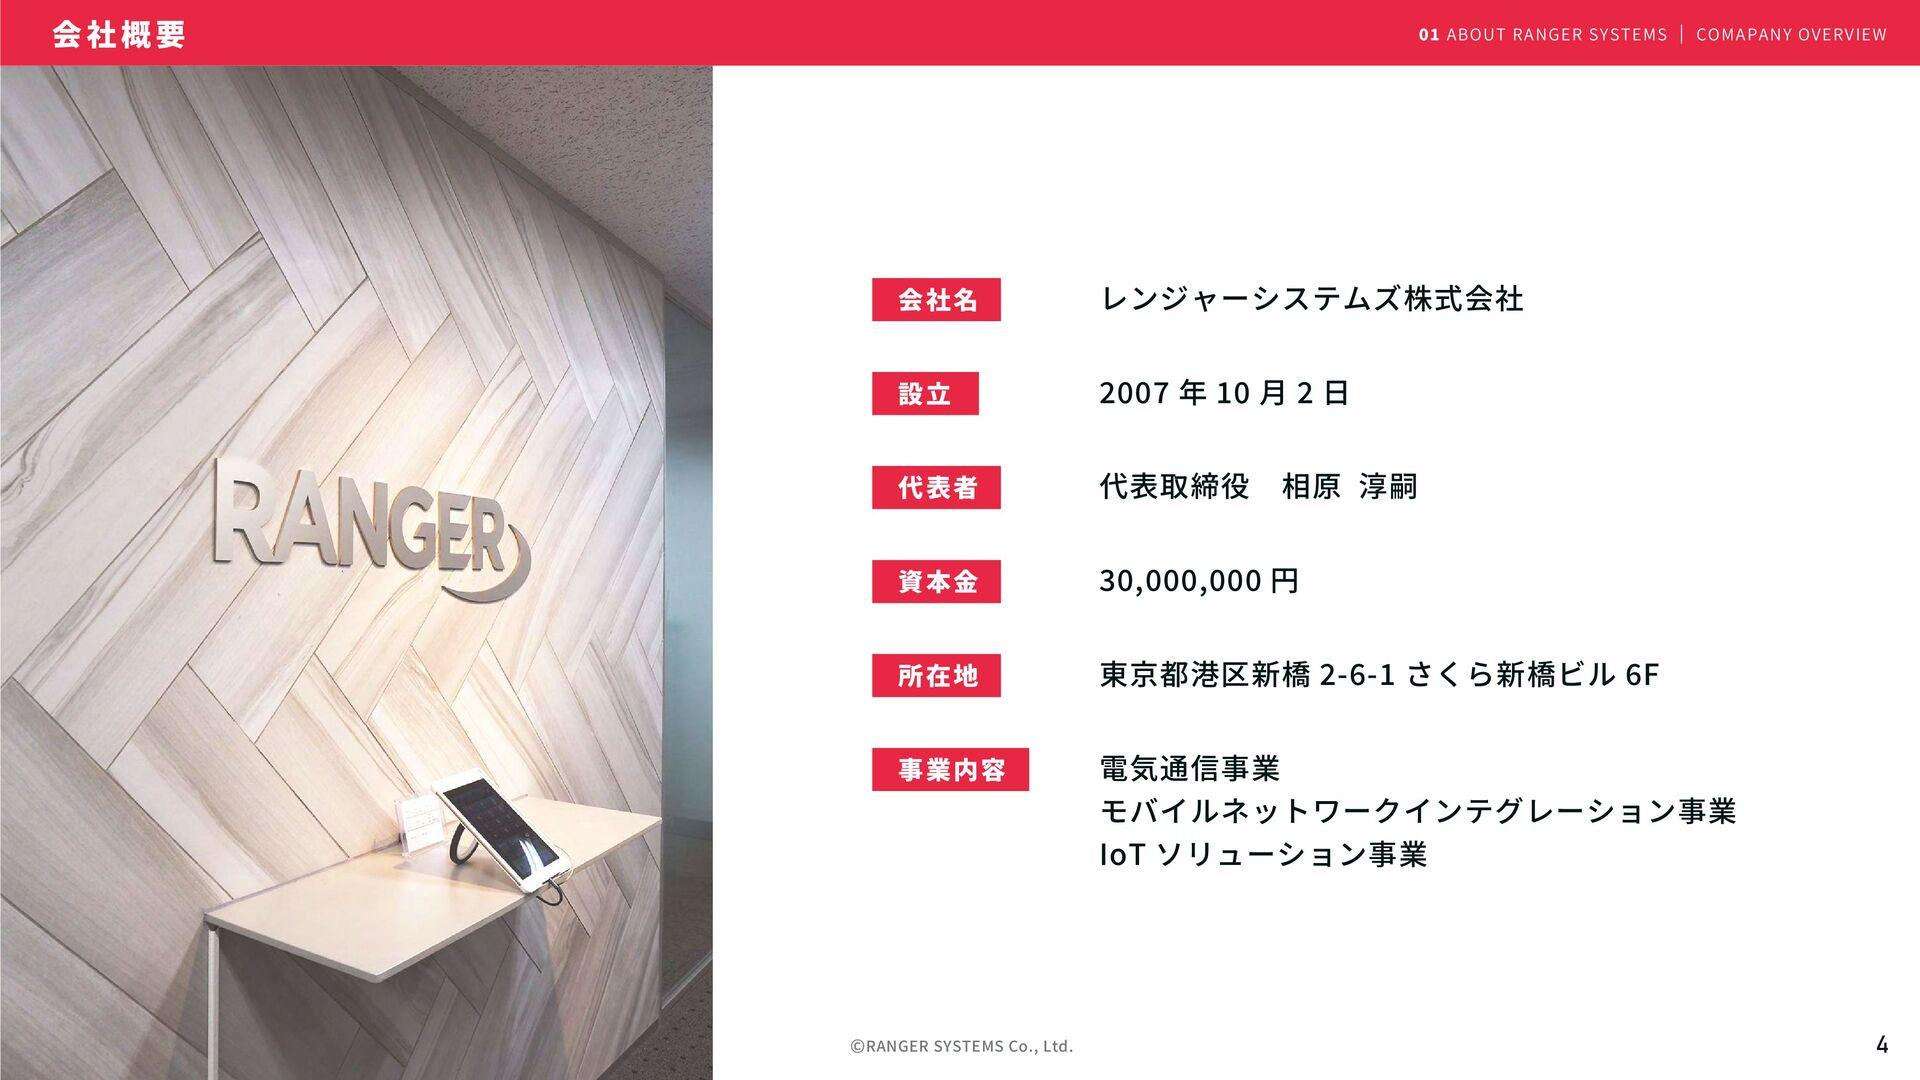 4 ©RANGER SYSTEMS Co., Ltd. レンジャーシステムズ株式会社  ���...